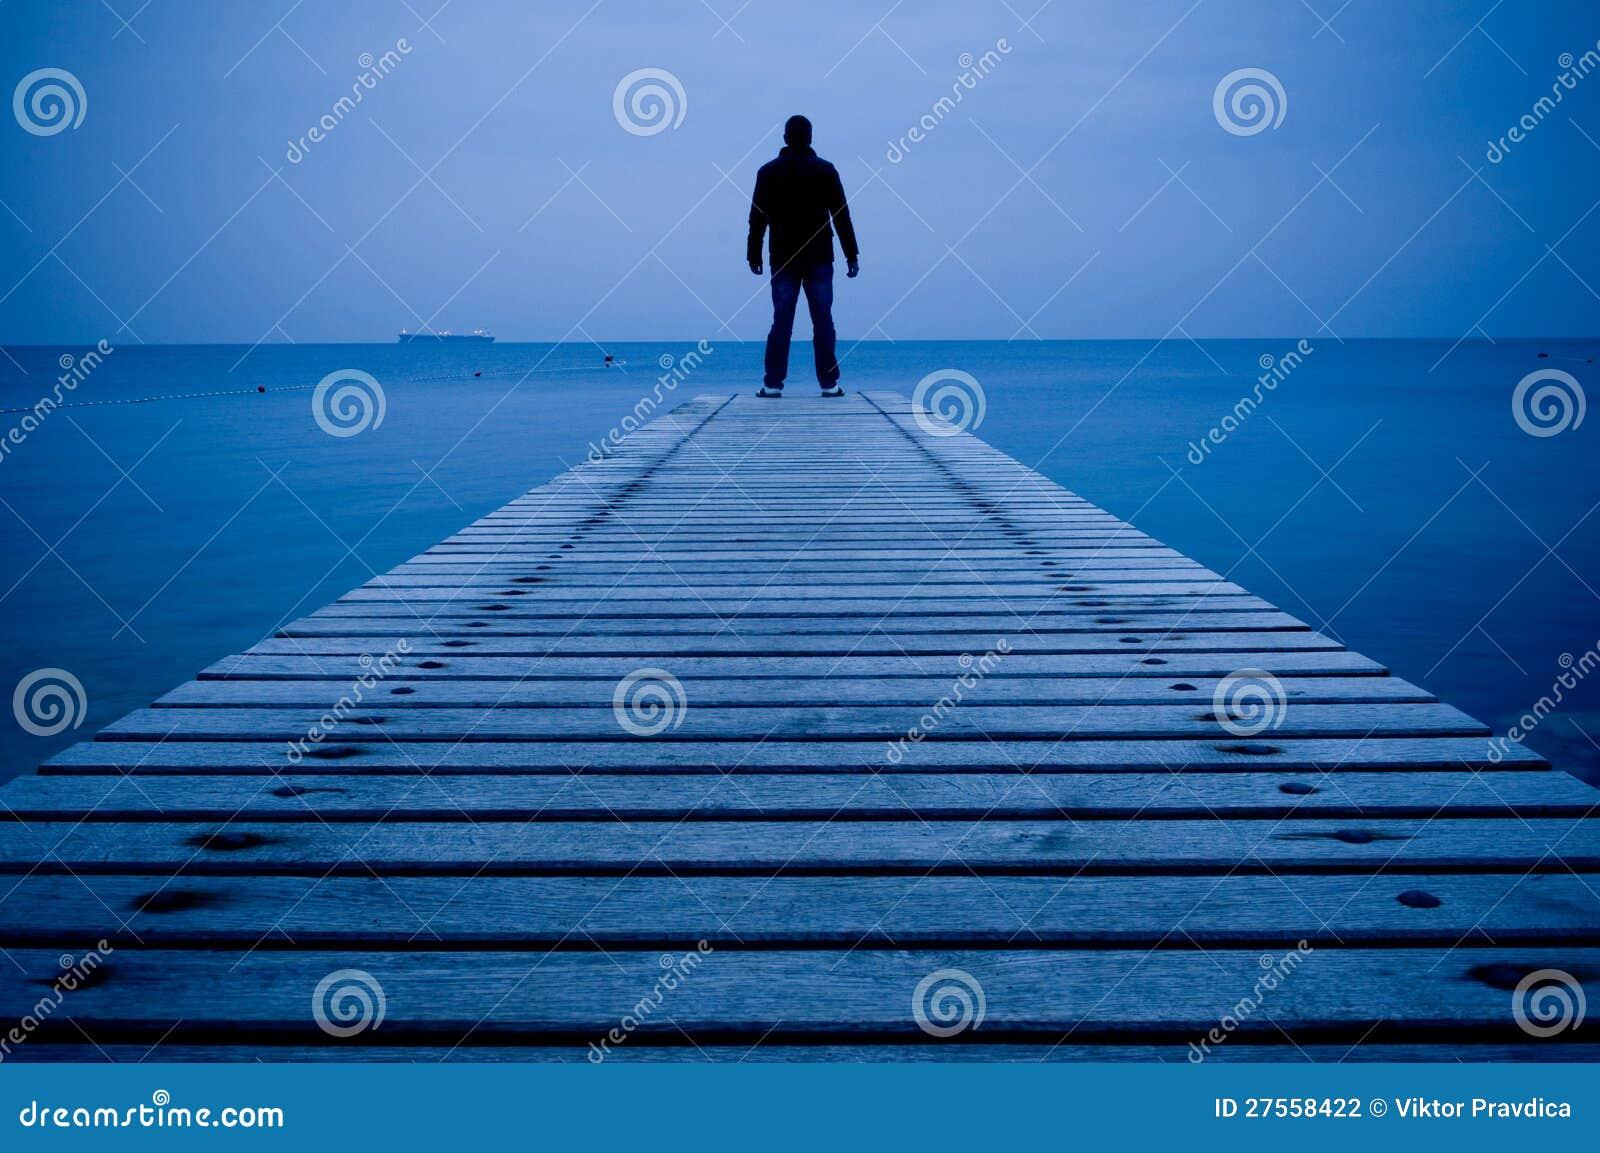 Man standing on a wooden pier